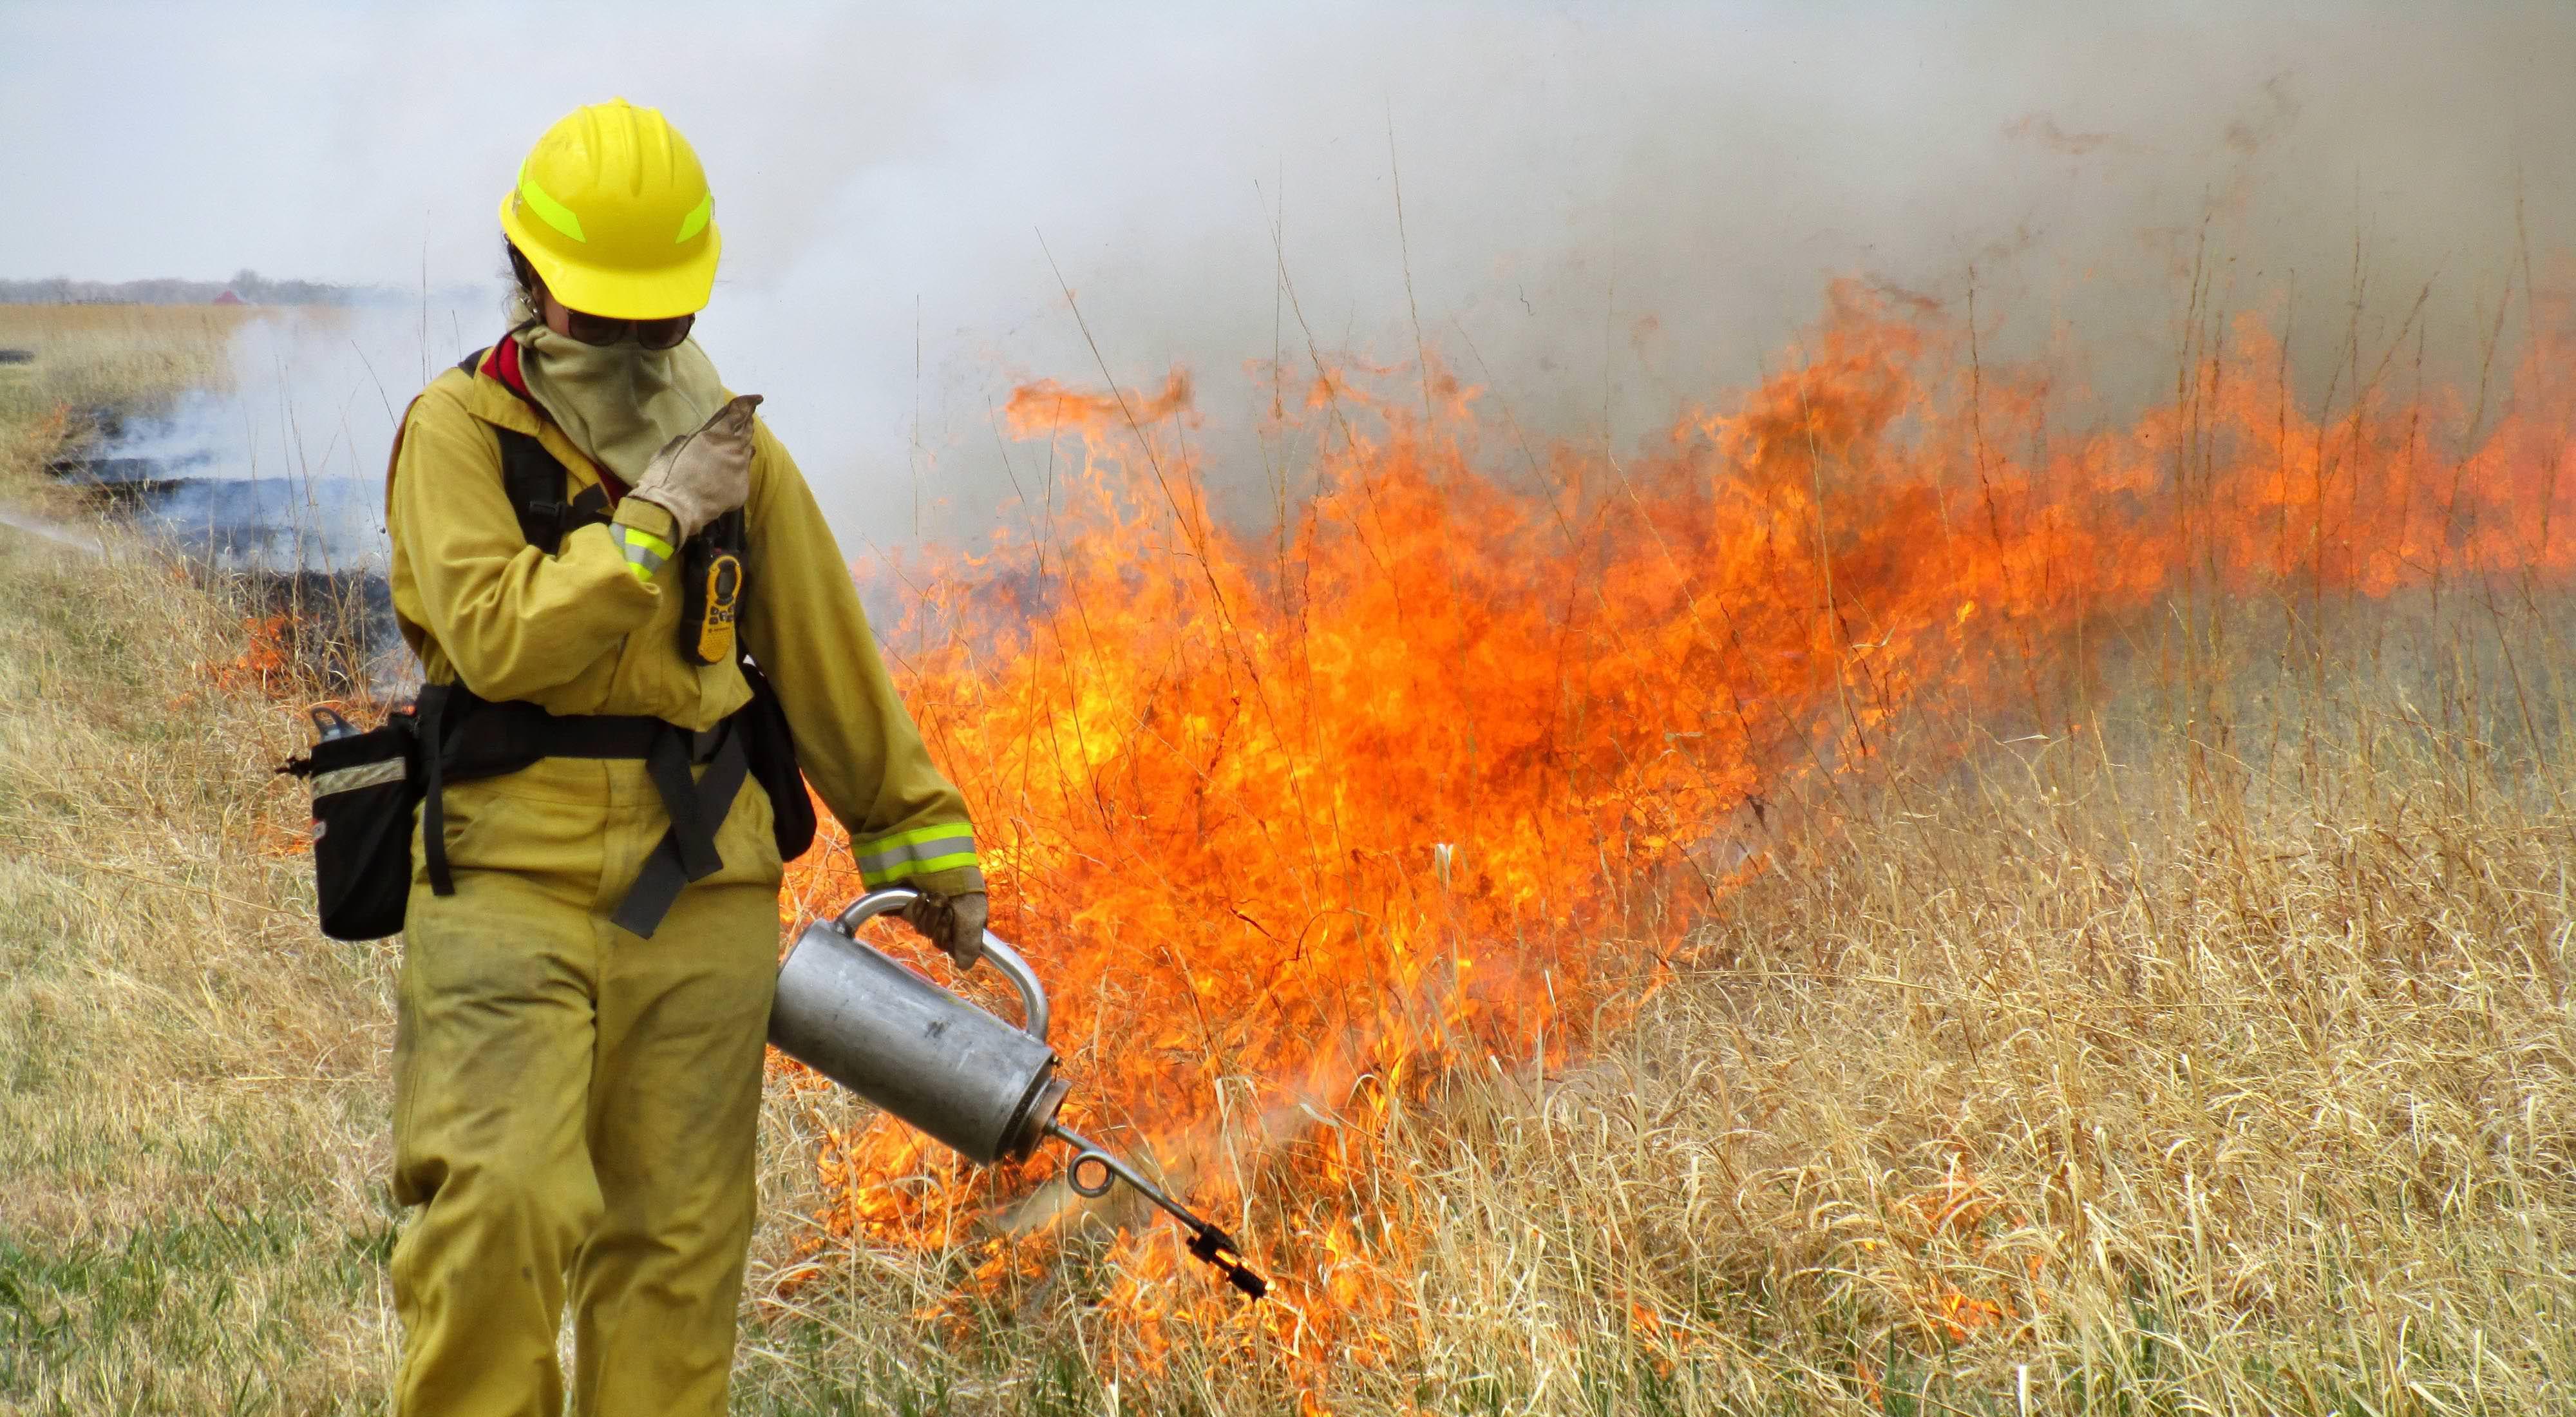 Prescribed fire at TNC Caveny tract.  Platte River Prairies, Nebraska.  Eliza Perry igniting. Photo credit: © Chris Helzer/TNC